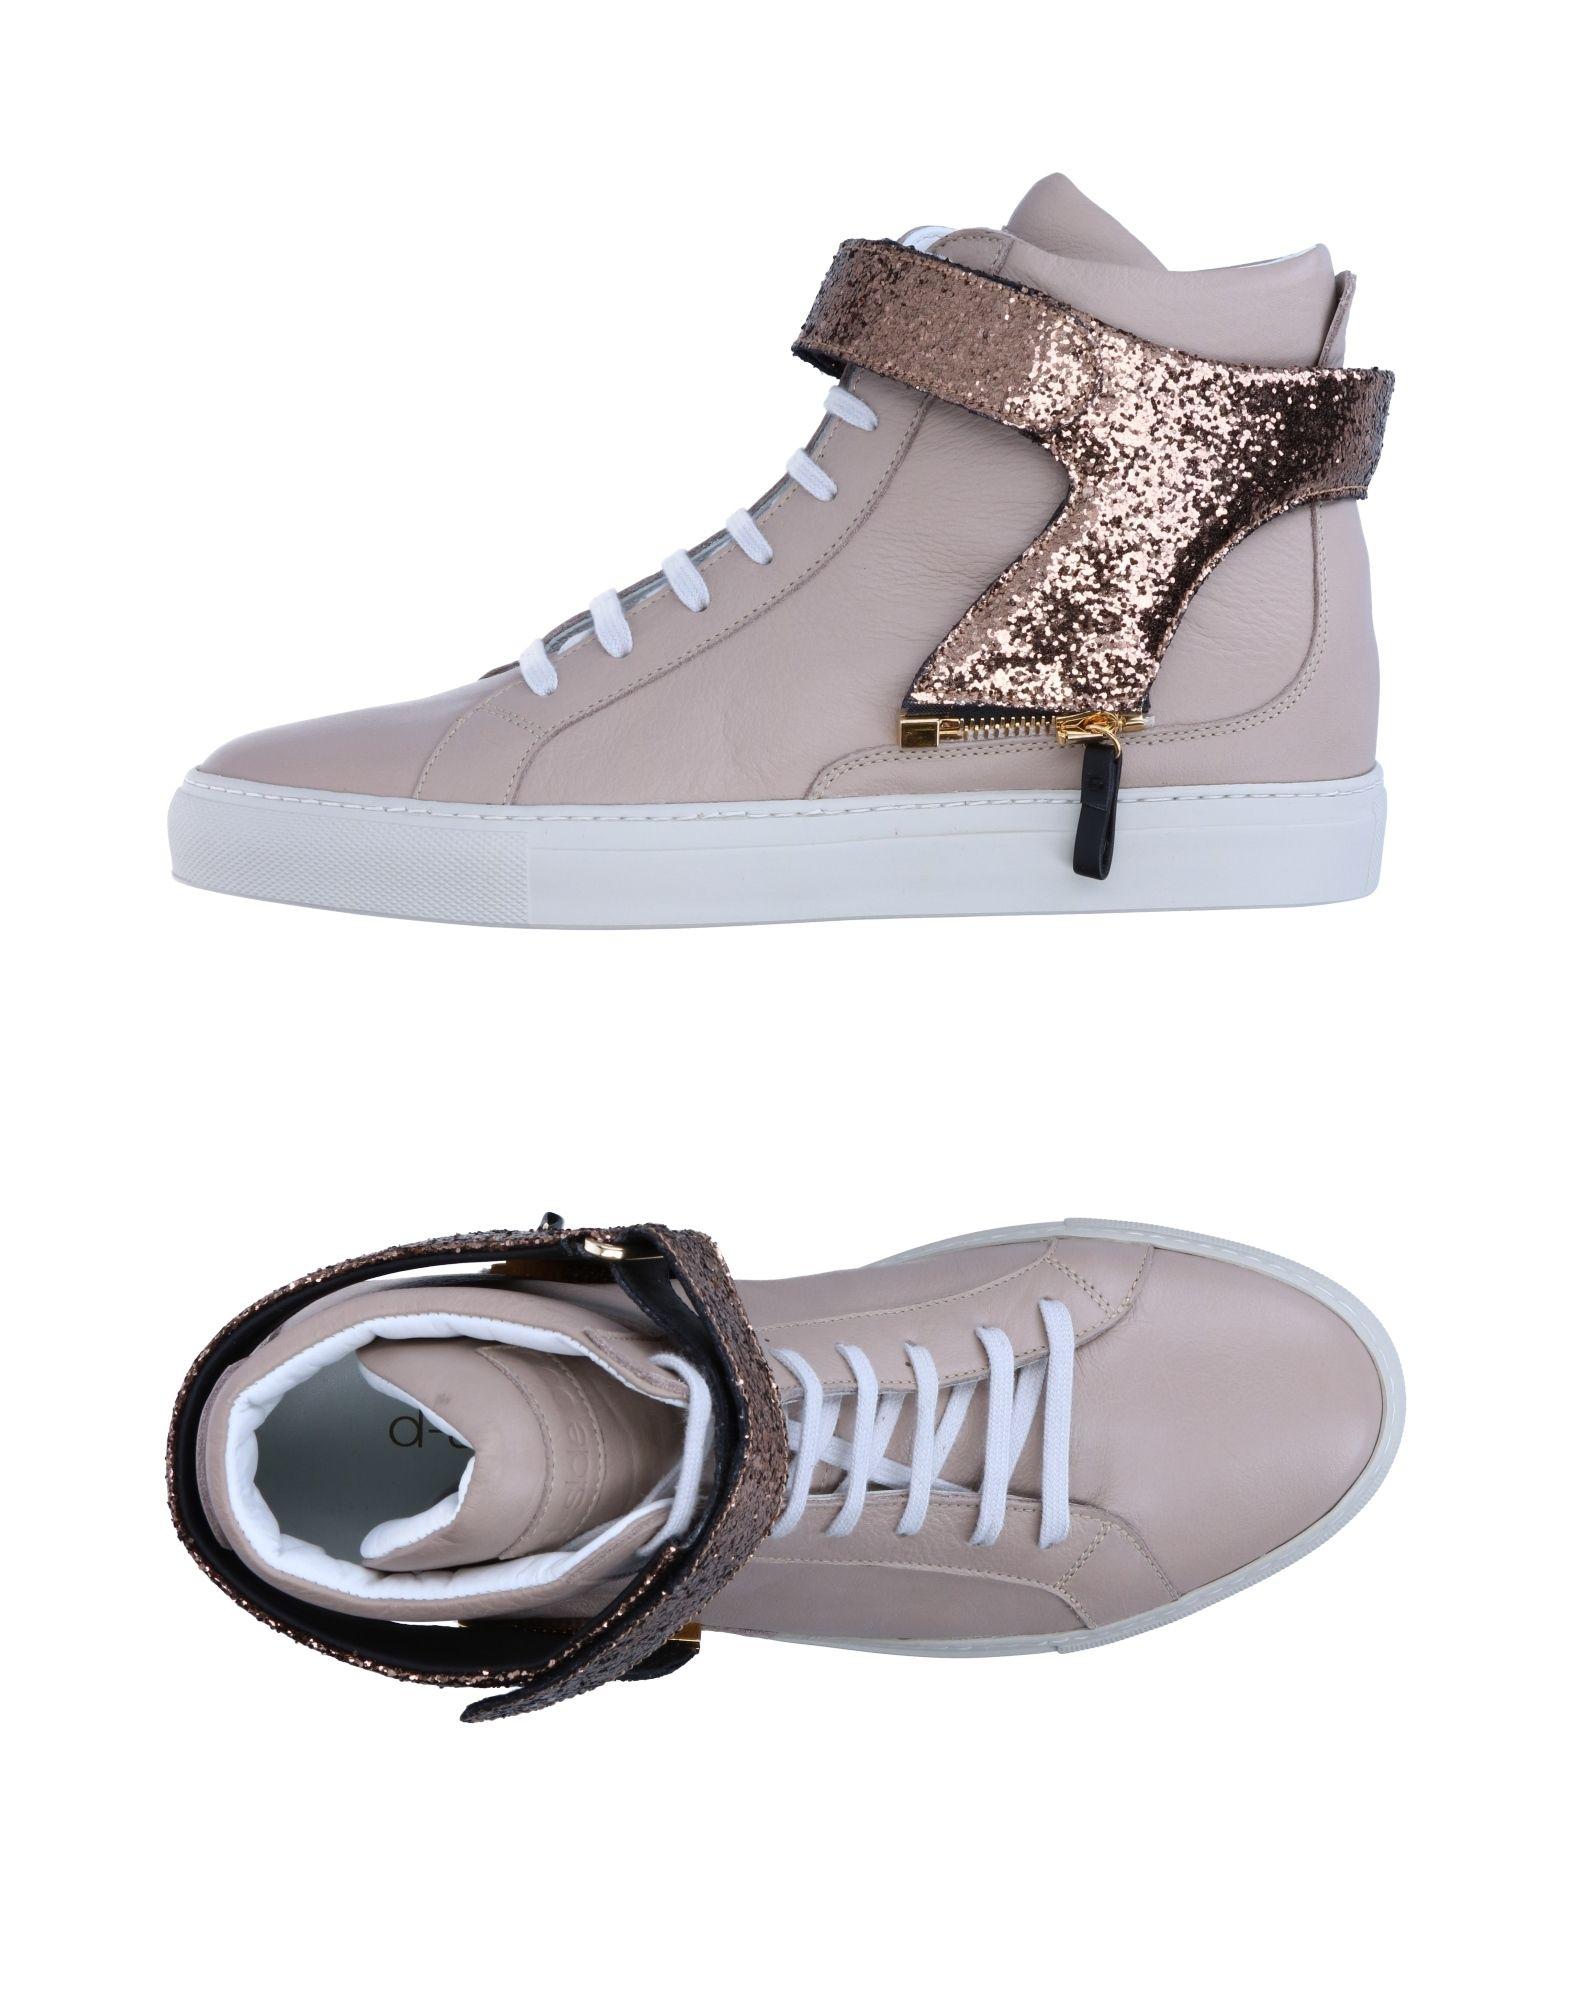 D-S!De Sneakers - Women D-S!De Australia Sneakers online on  Australia D-S!De - 11236421WB c439c0